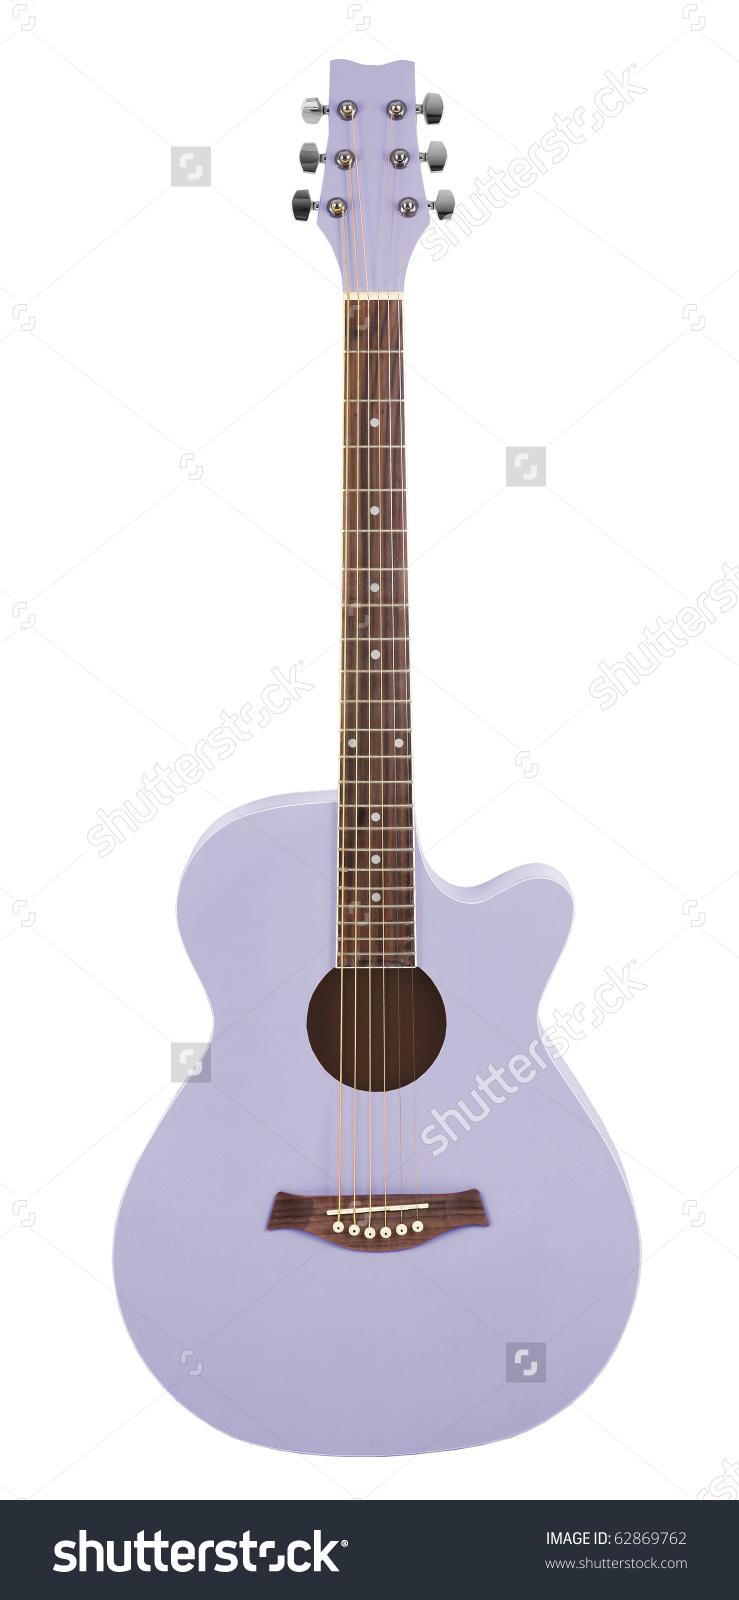 Pastel Purple Acoustic Cutaway Girlie Guitar Stock Photo 62869762.